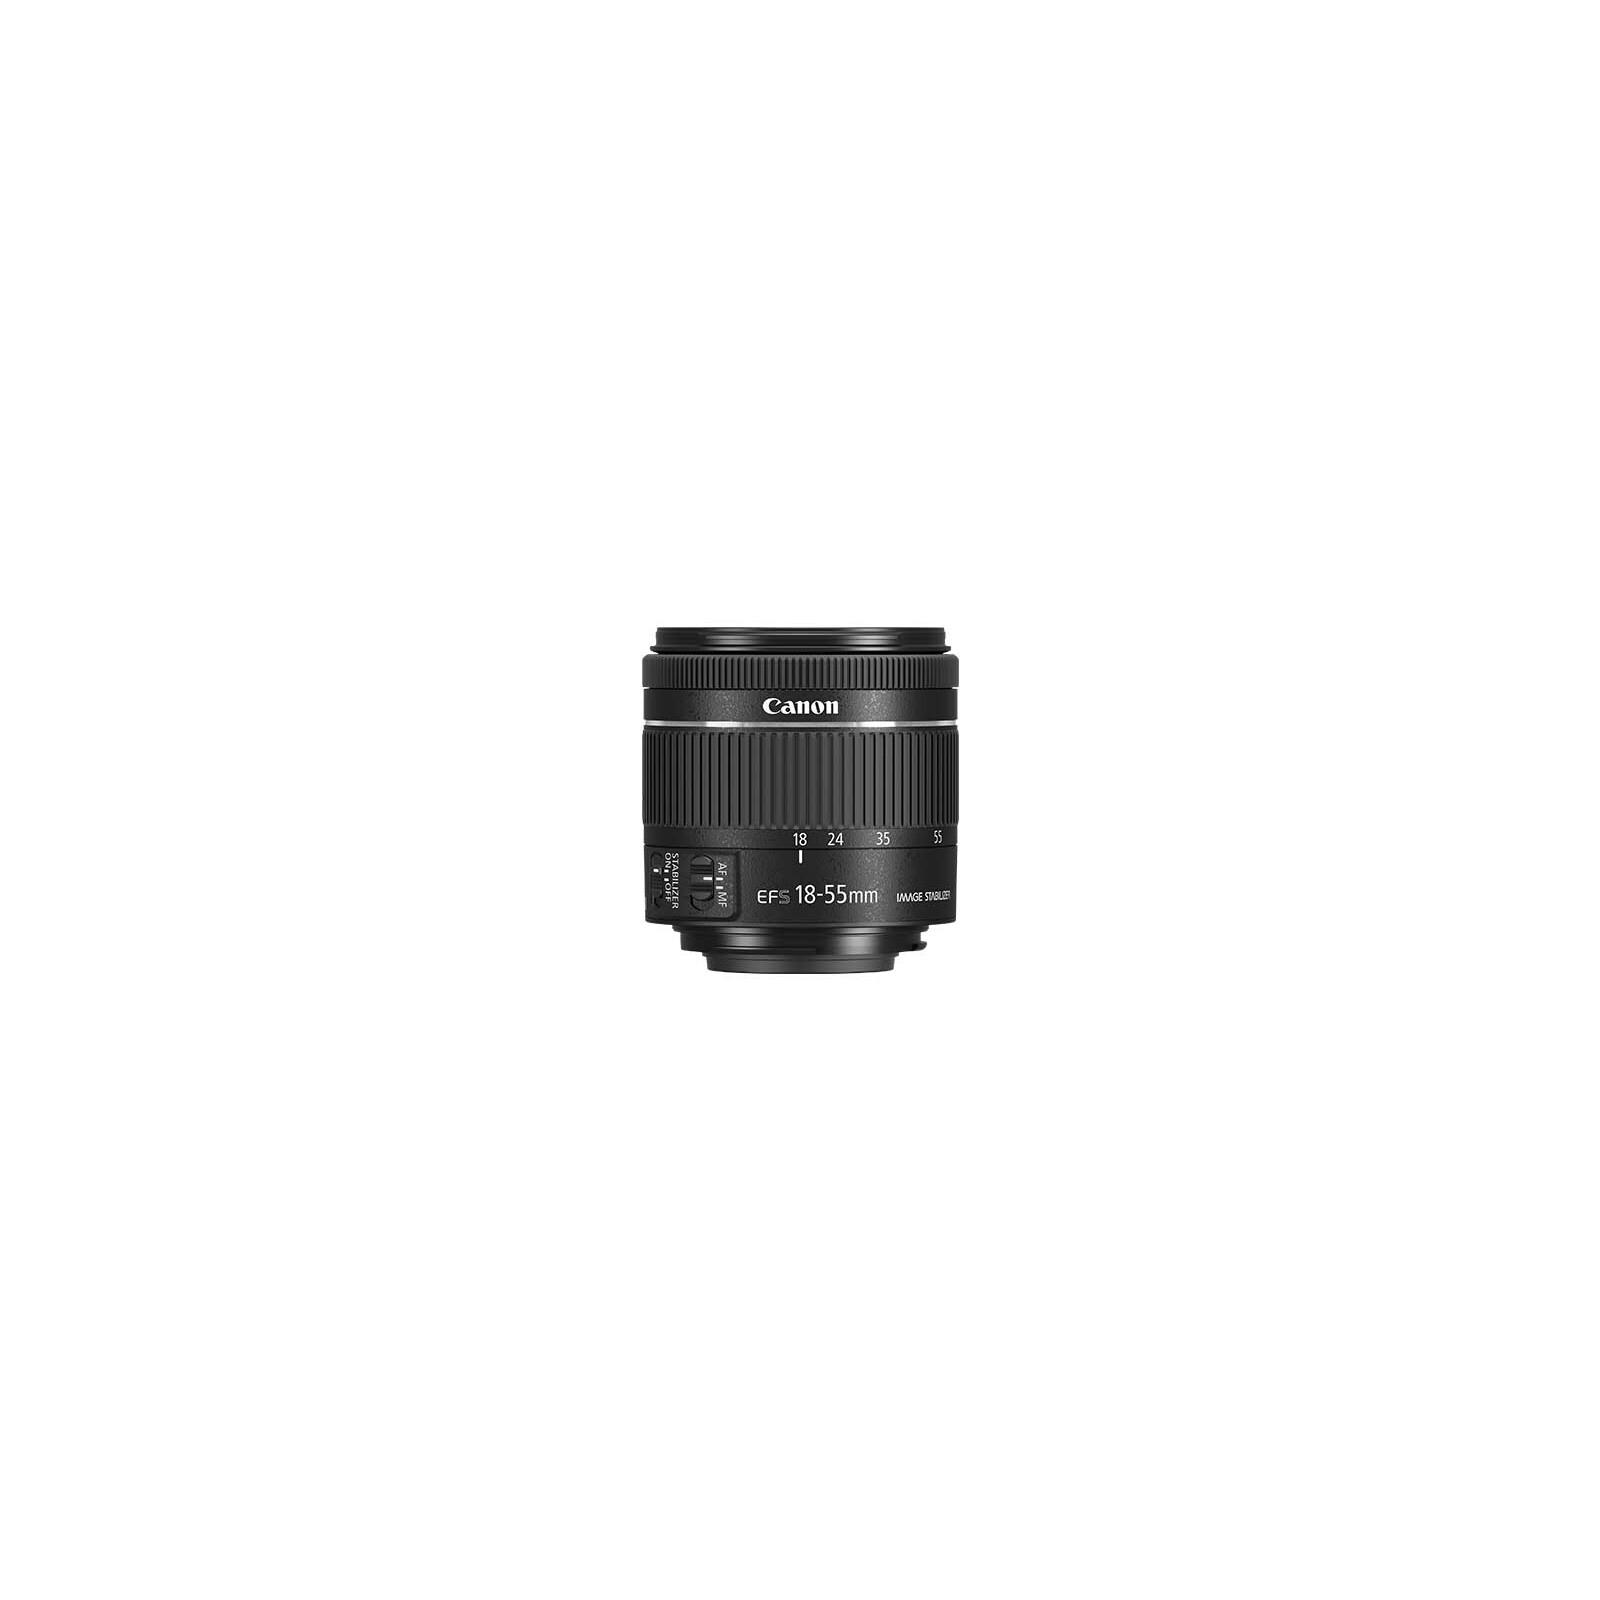 Canon EF-S 18-55/4,0-5,6 IS STM + UV Filter